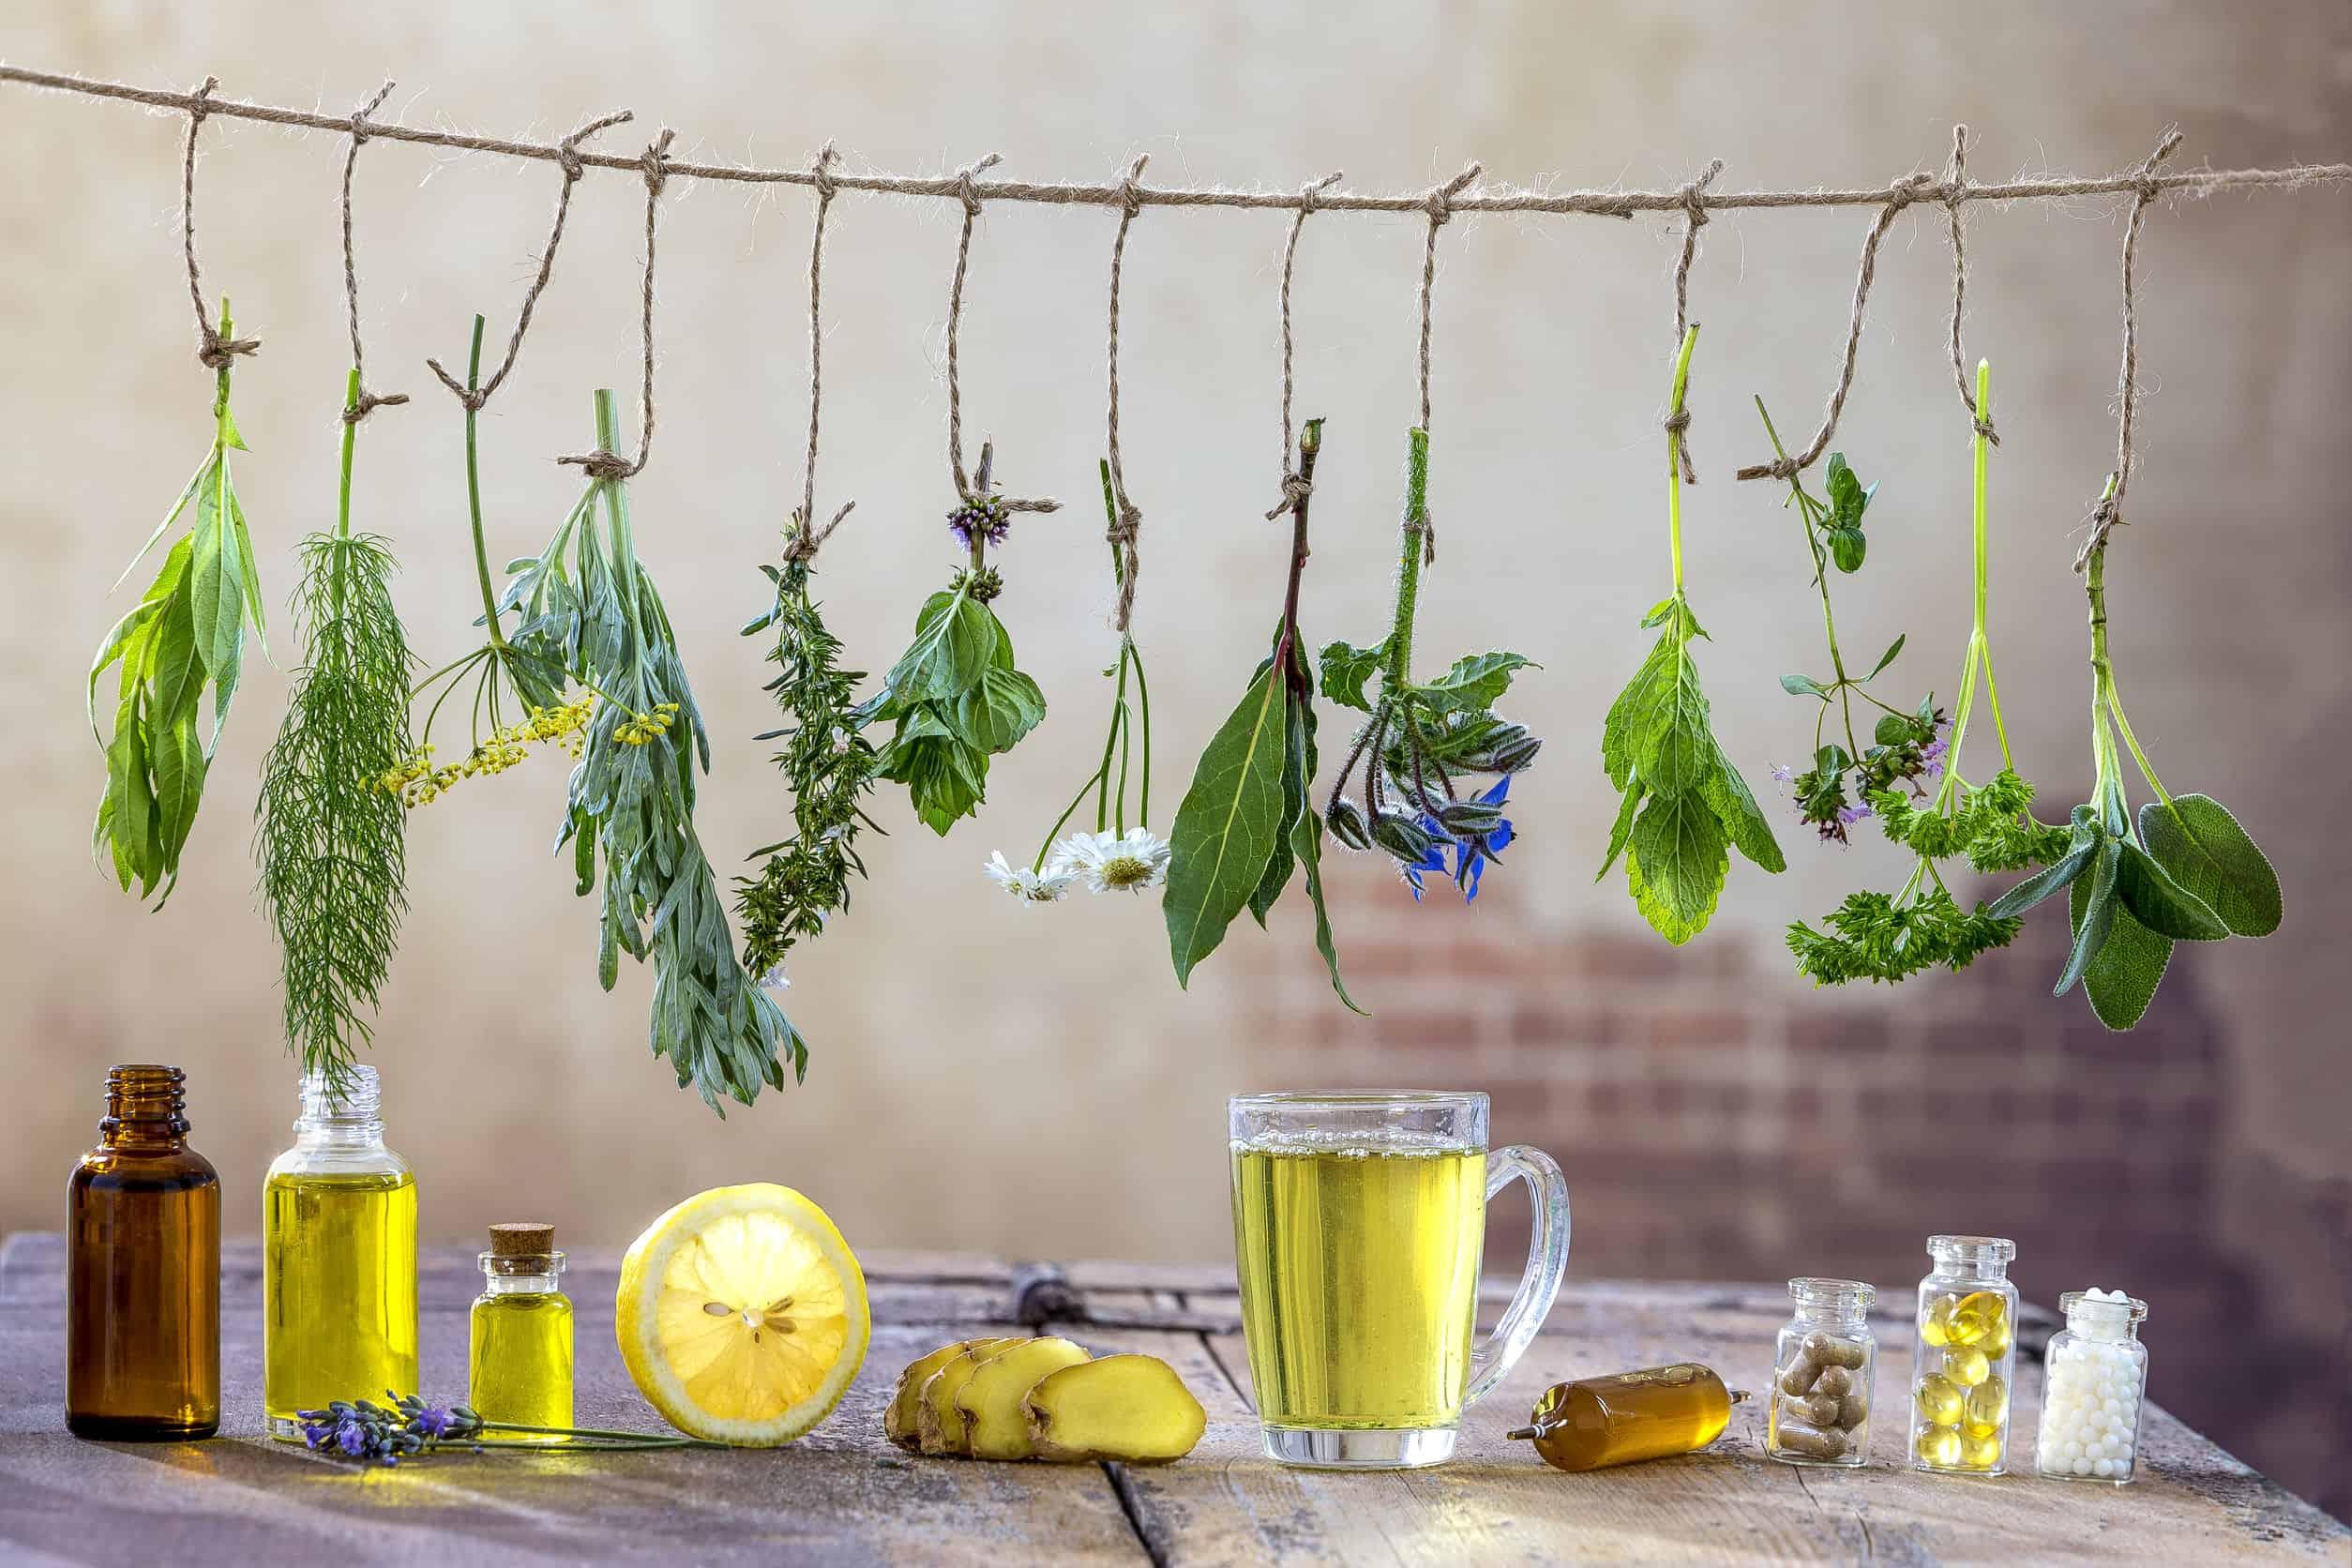 Herbal Preparedness: Hacks to Nurture Your Future Self